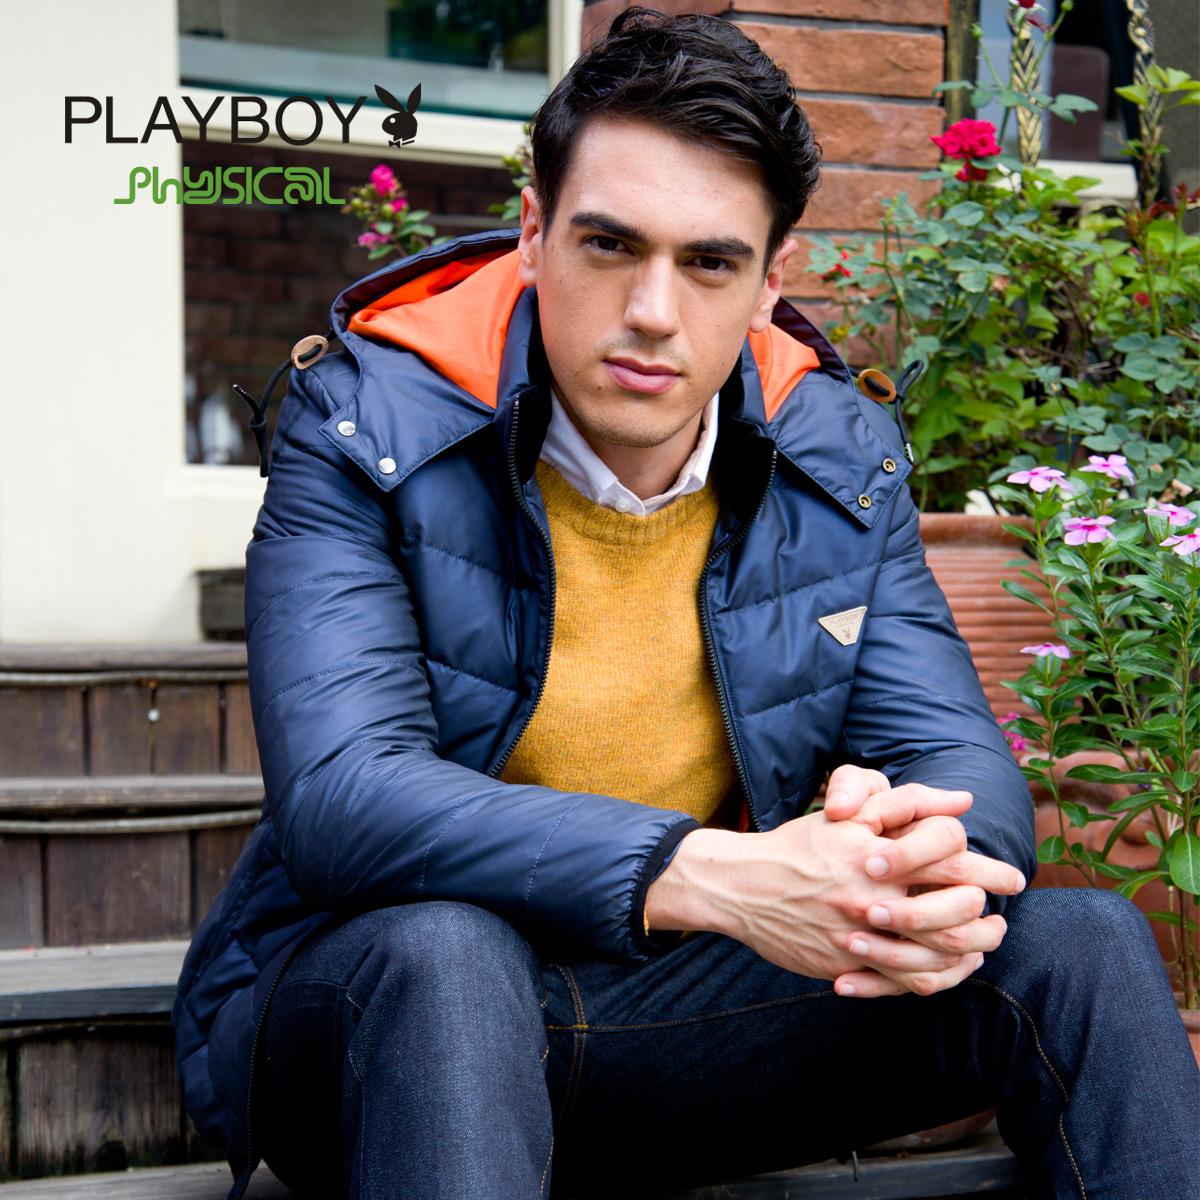 Спортивный пуховик Playboy  2014 спортивный пуховик playboy 2014 ds5005